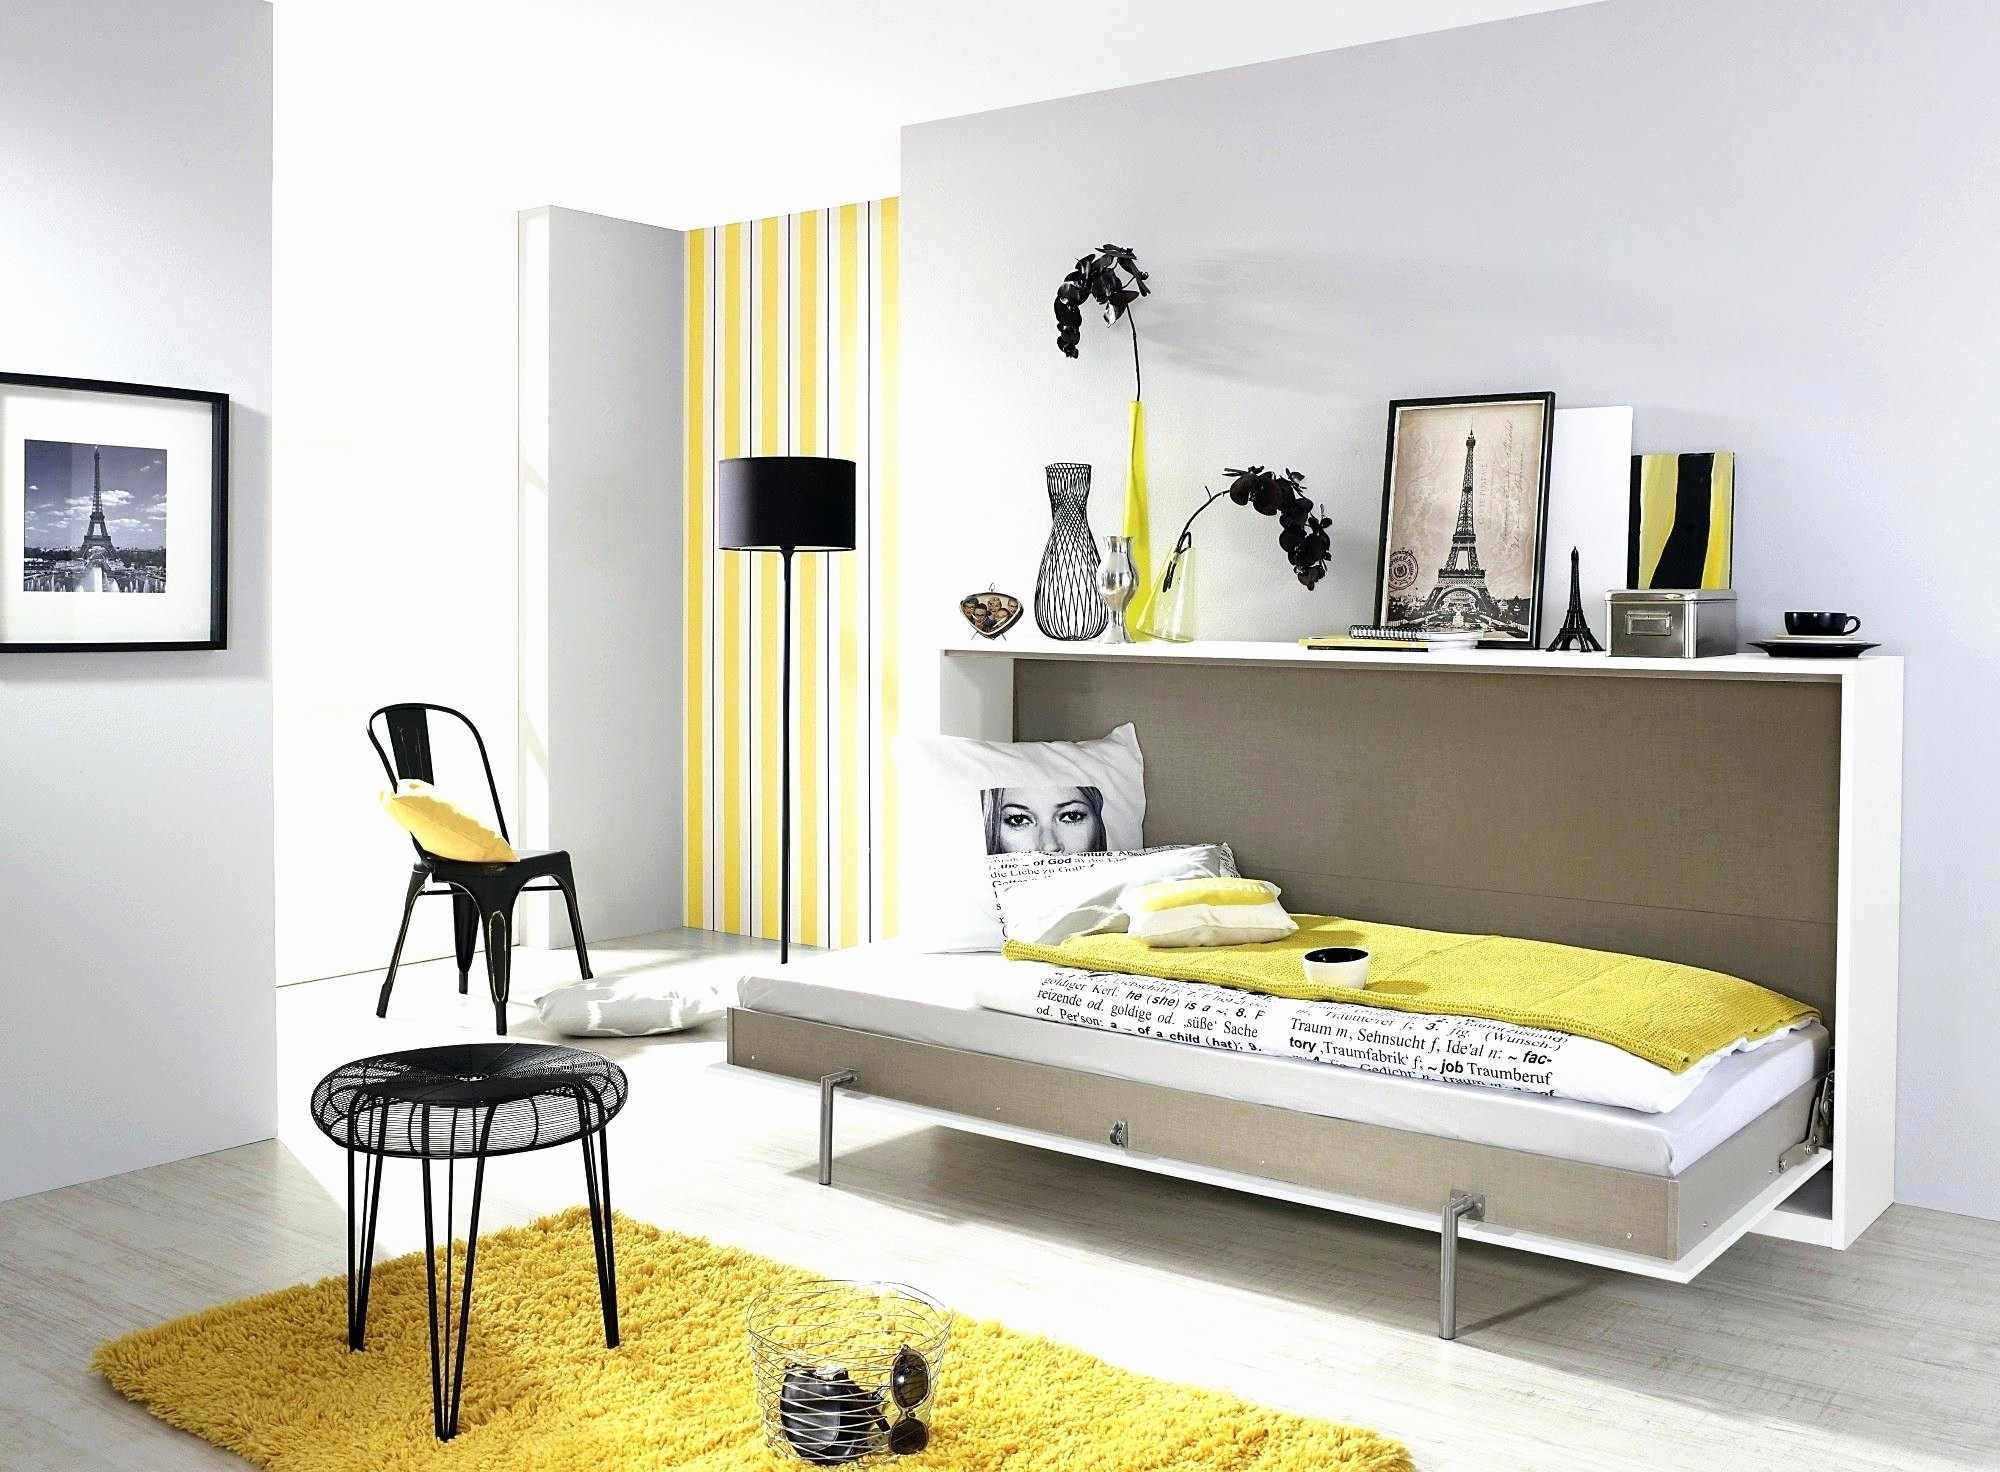 Lit Escamotable Ikea Bel Glamour Ikea Canape Blanc Et Armoire Lit Escamotable Ikea Fresh